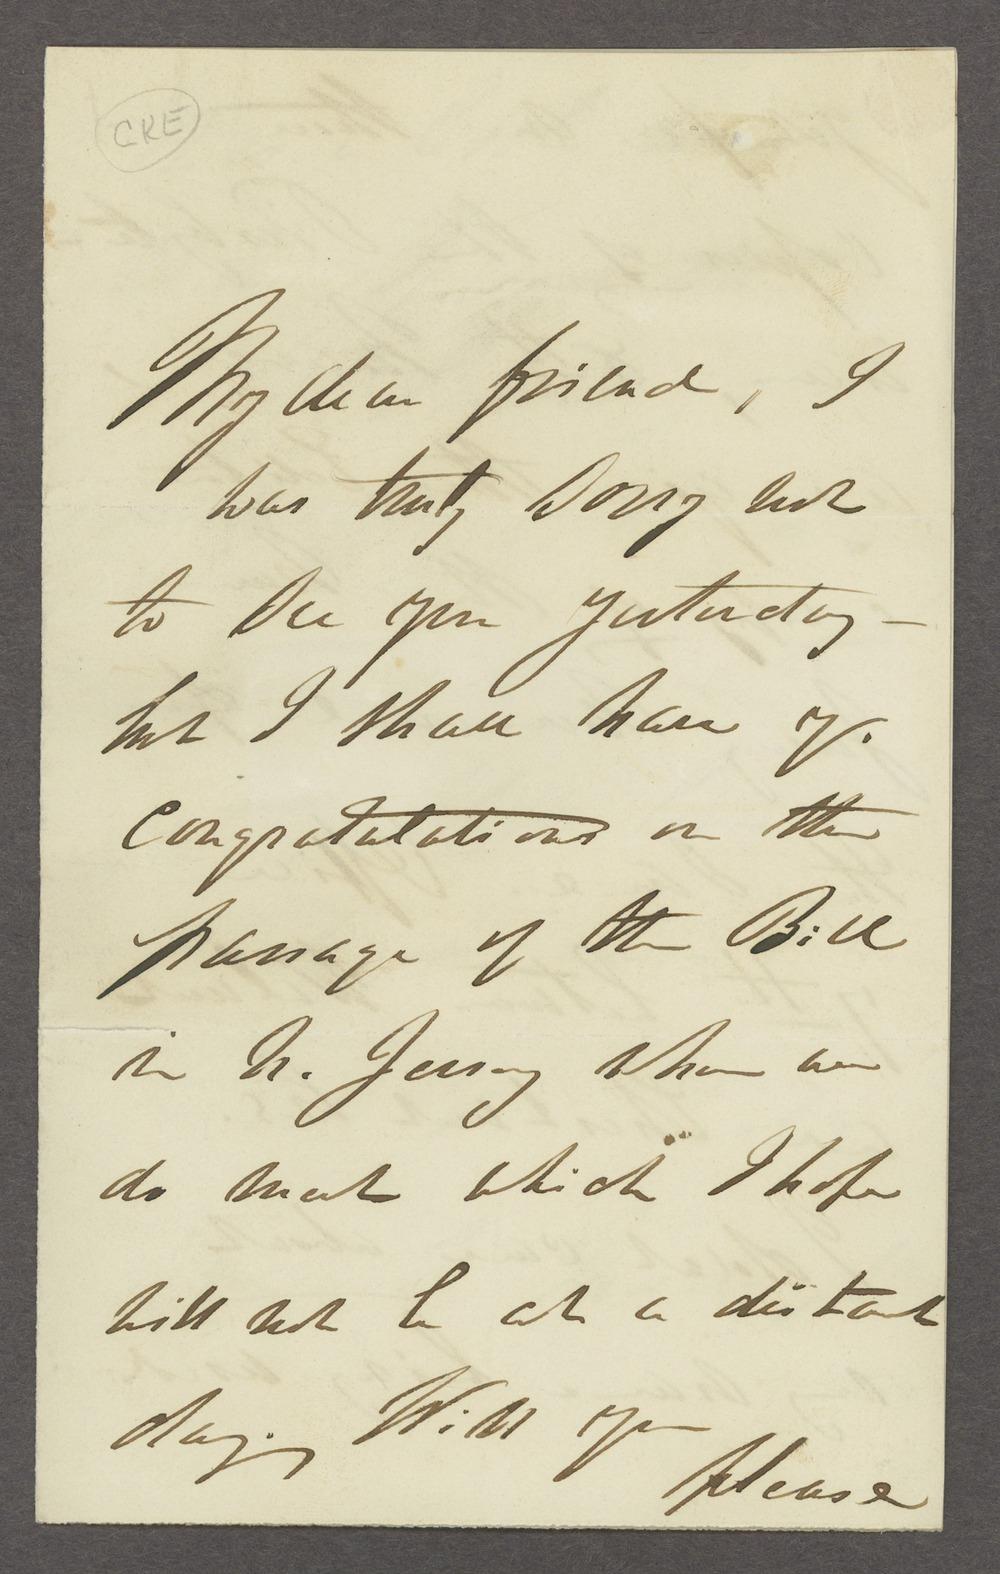 Dorothea Dix correspondence - 1 [Box 1 Folder 3]